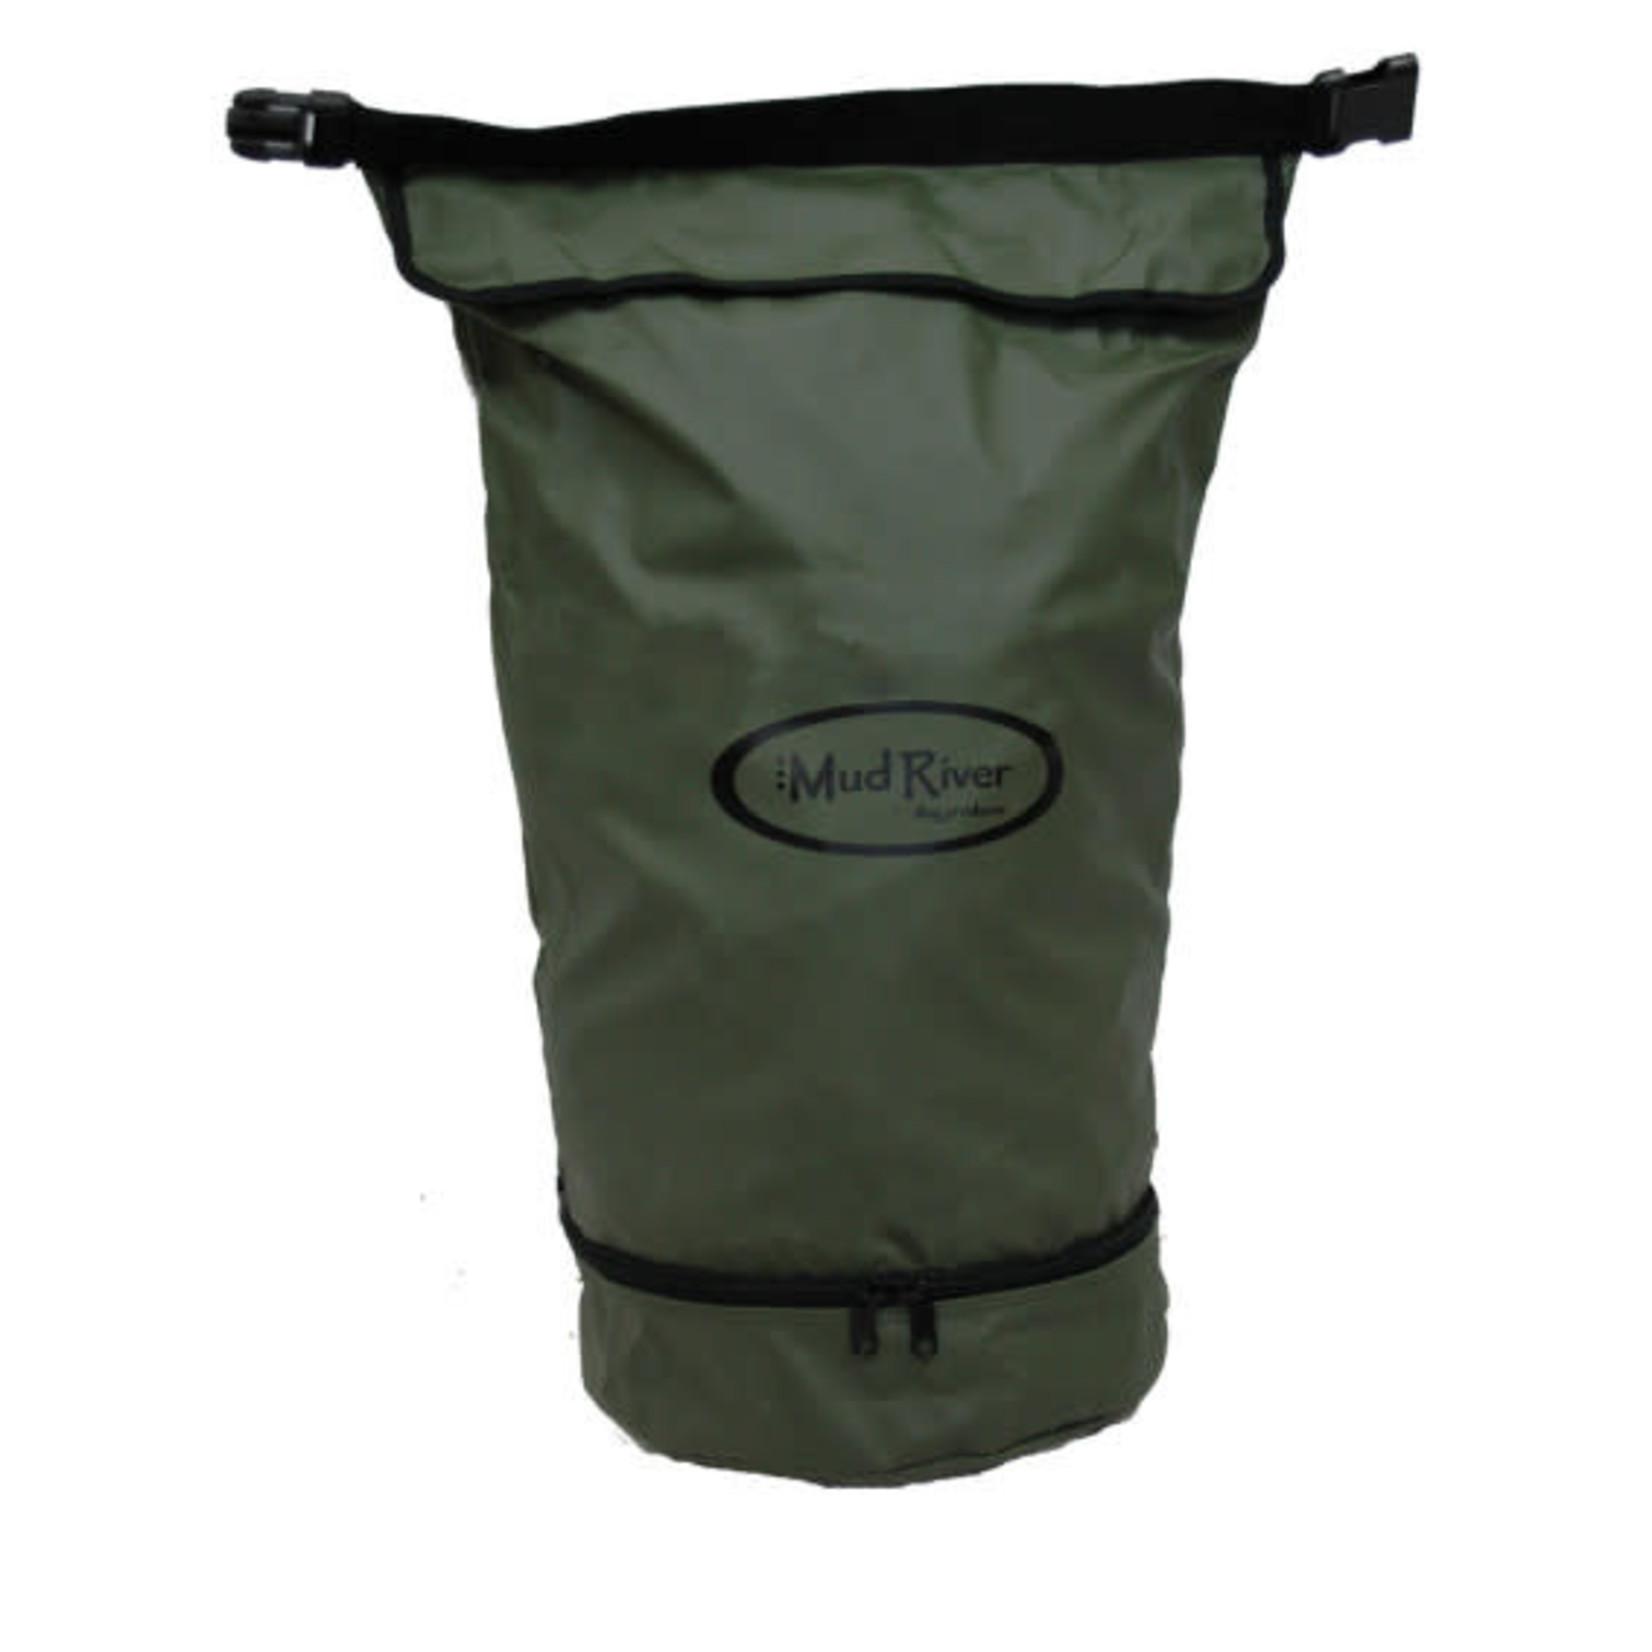 BOYT HARNESS COMPANY Mud River Magnum Hoss Food Storage Bag